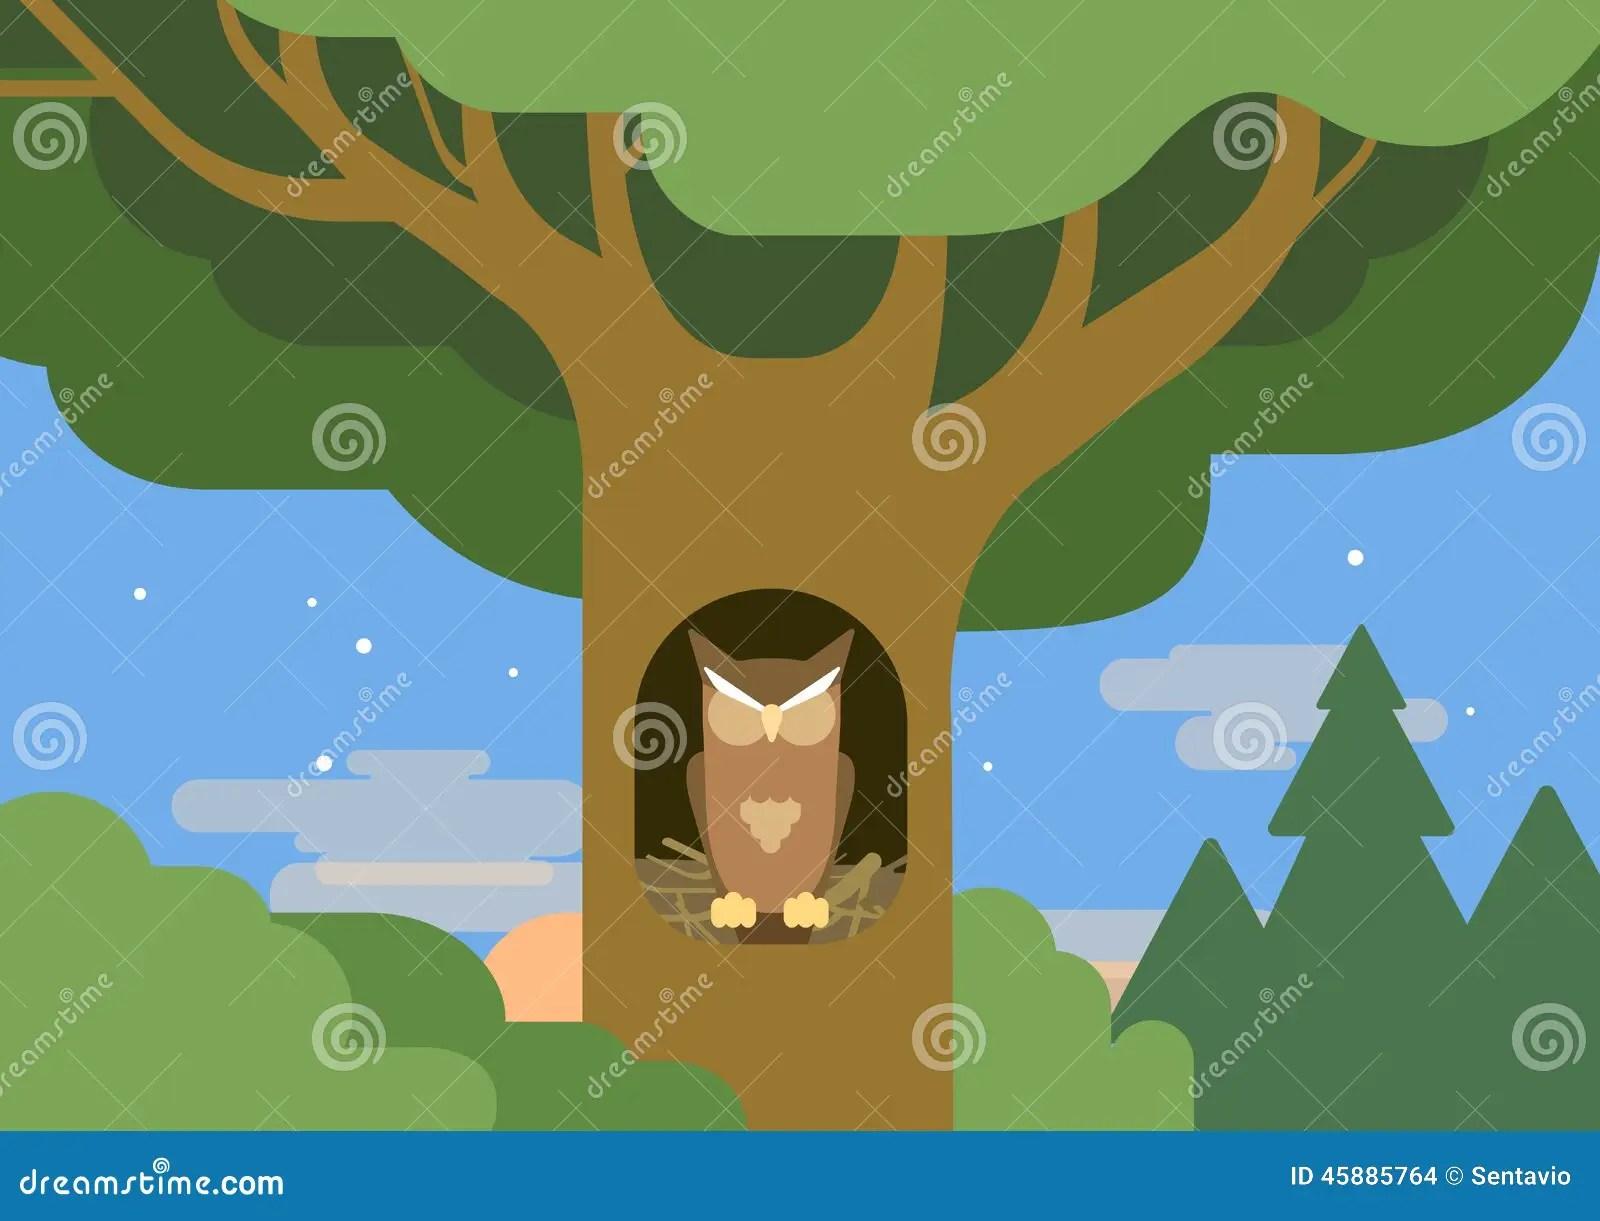 Owl Hollow Forest Habitat Flat Cartoon Vector Wild Animal